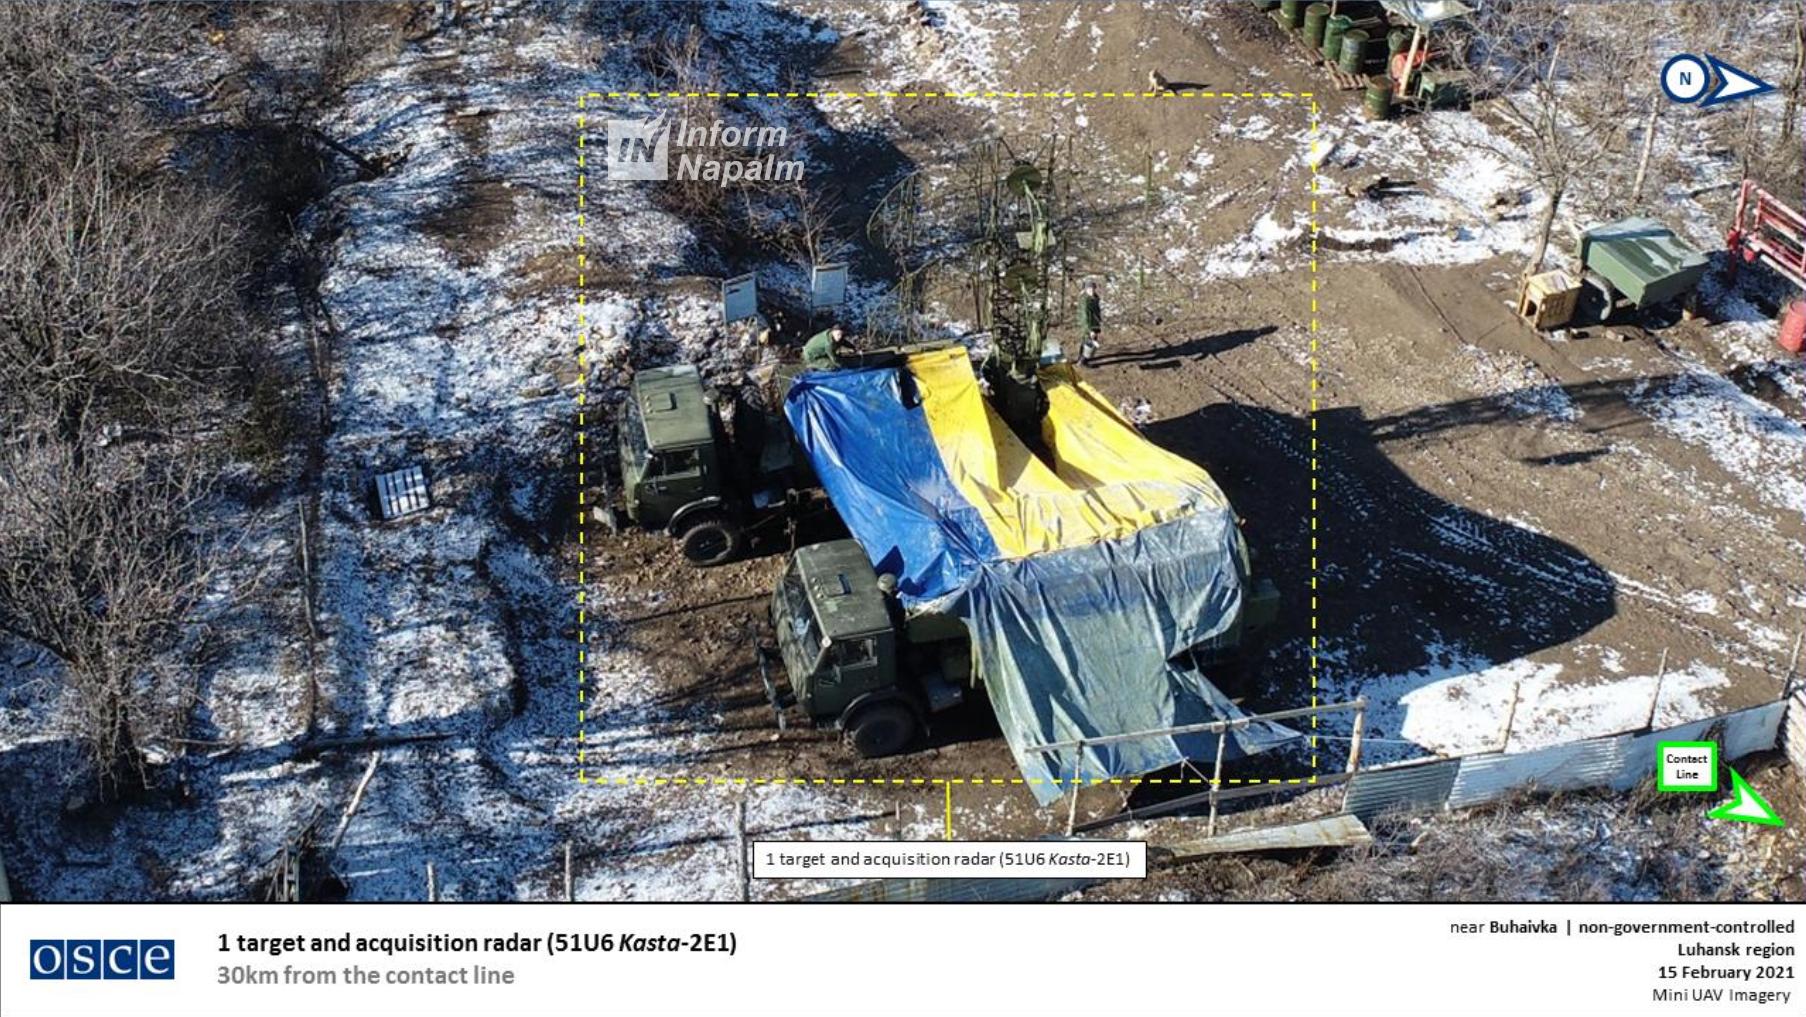 Radarstation 51U6 Kasta-2E1 i Donbas